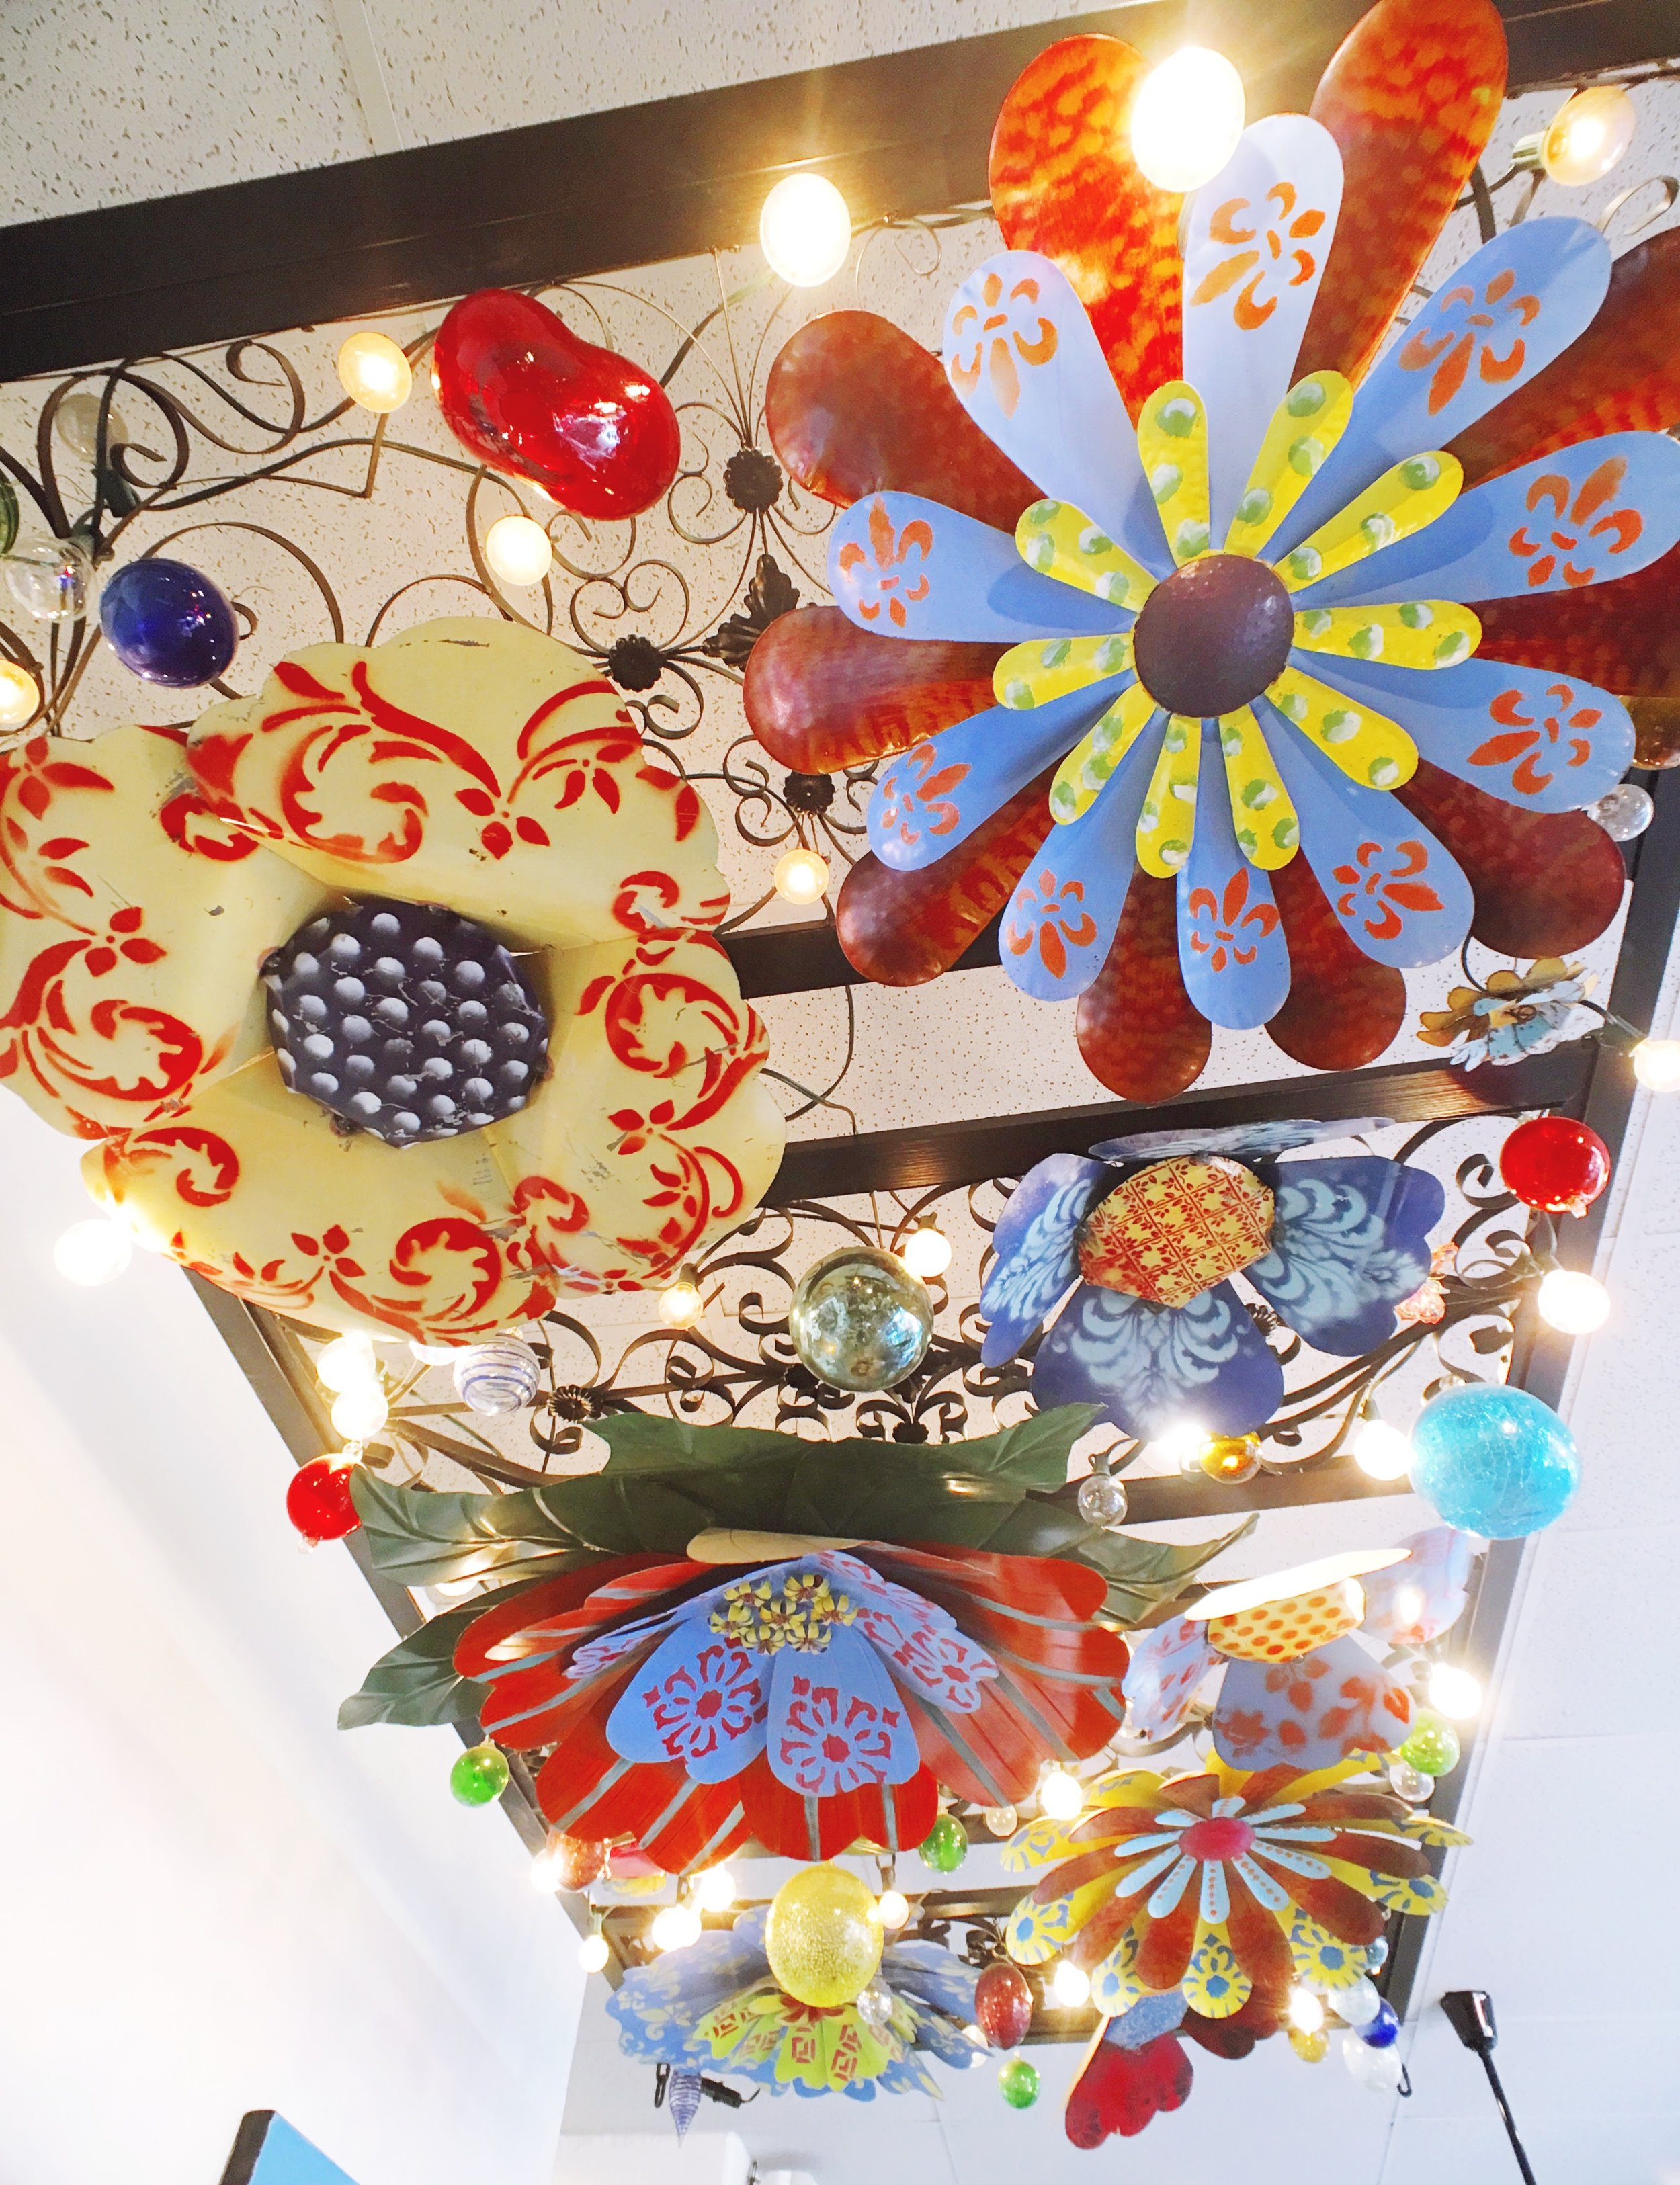 Metal Flower Ceiling art installation at La Mo Cafe in Turlock, CA